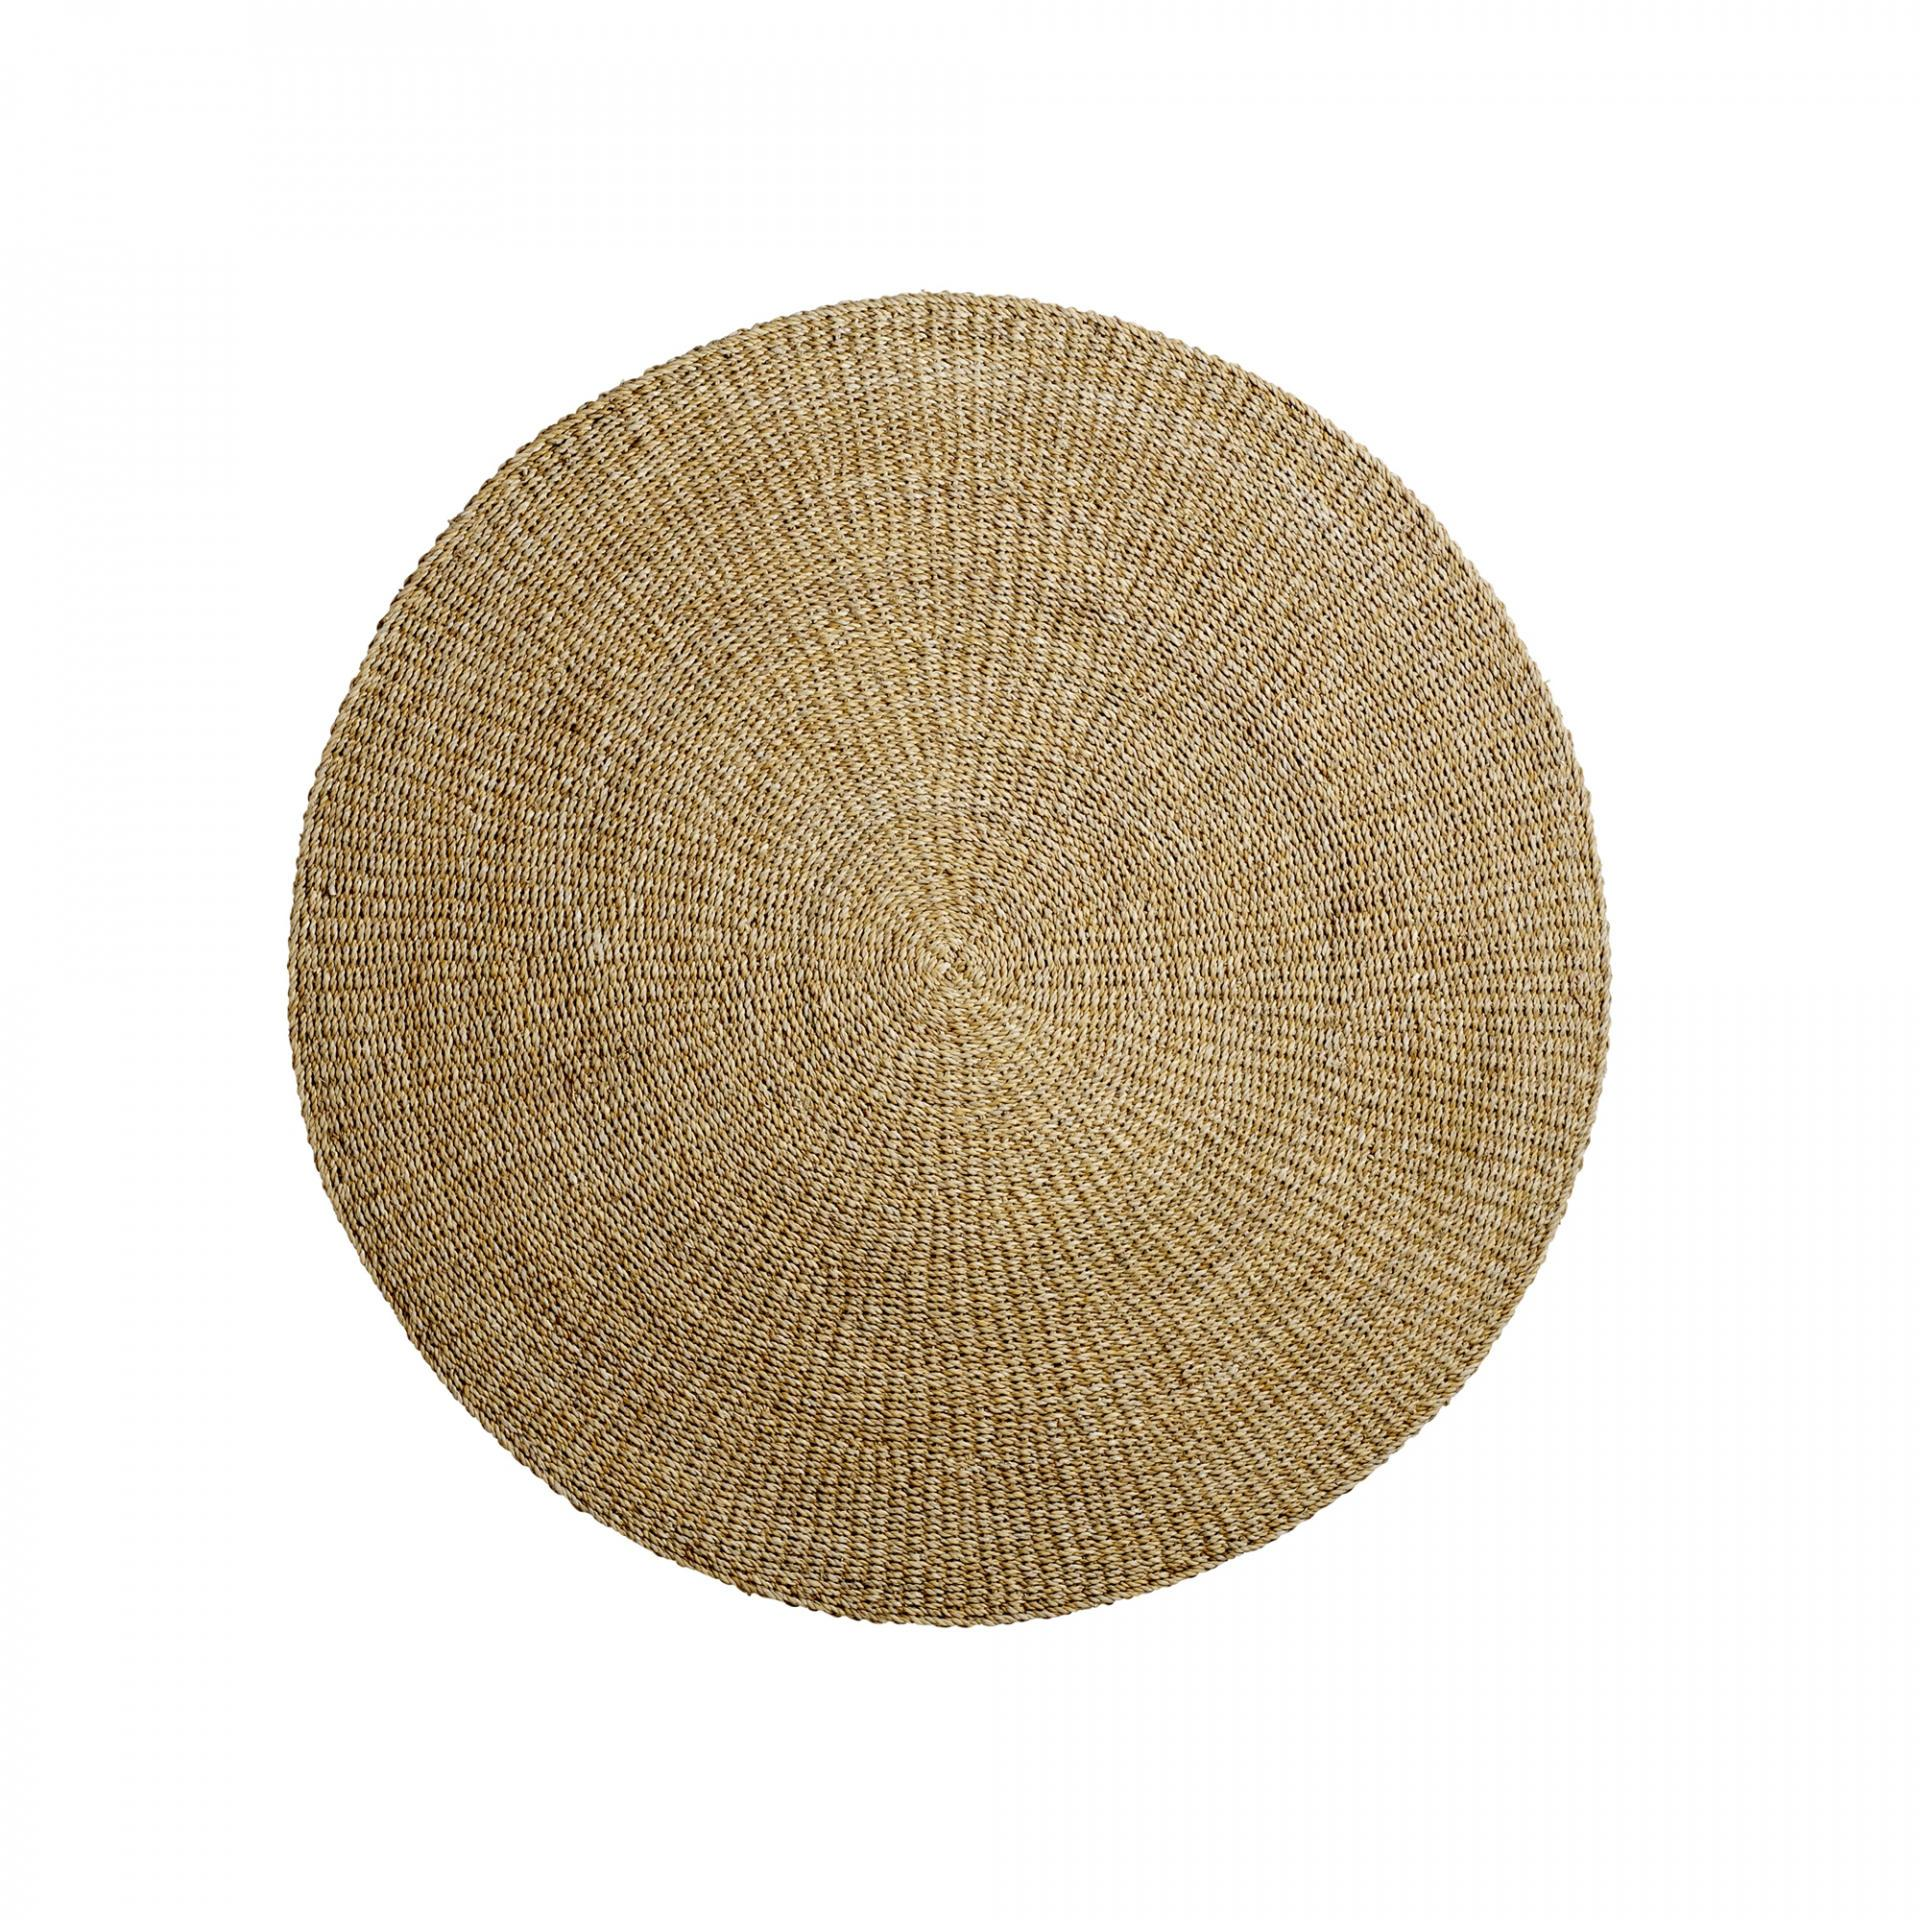 Bloomingville Kulatý koberec Sea Grass 120cm, hnědá barva